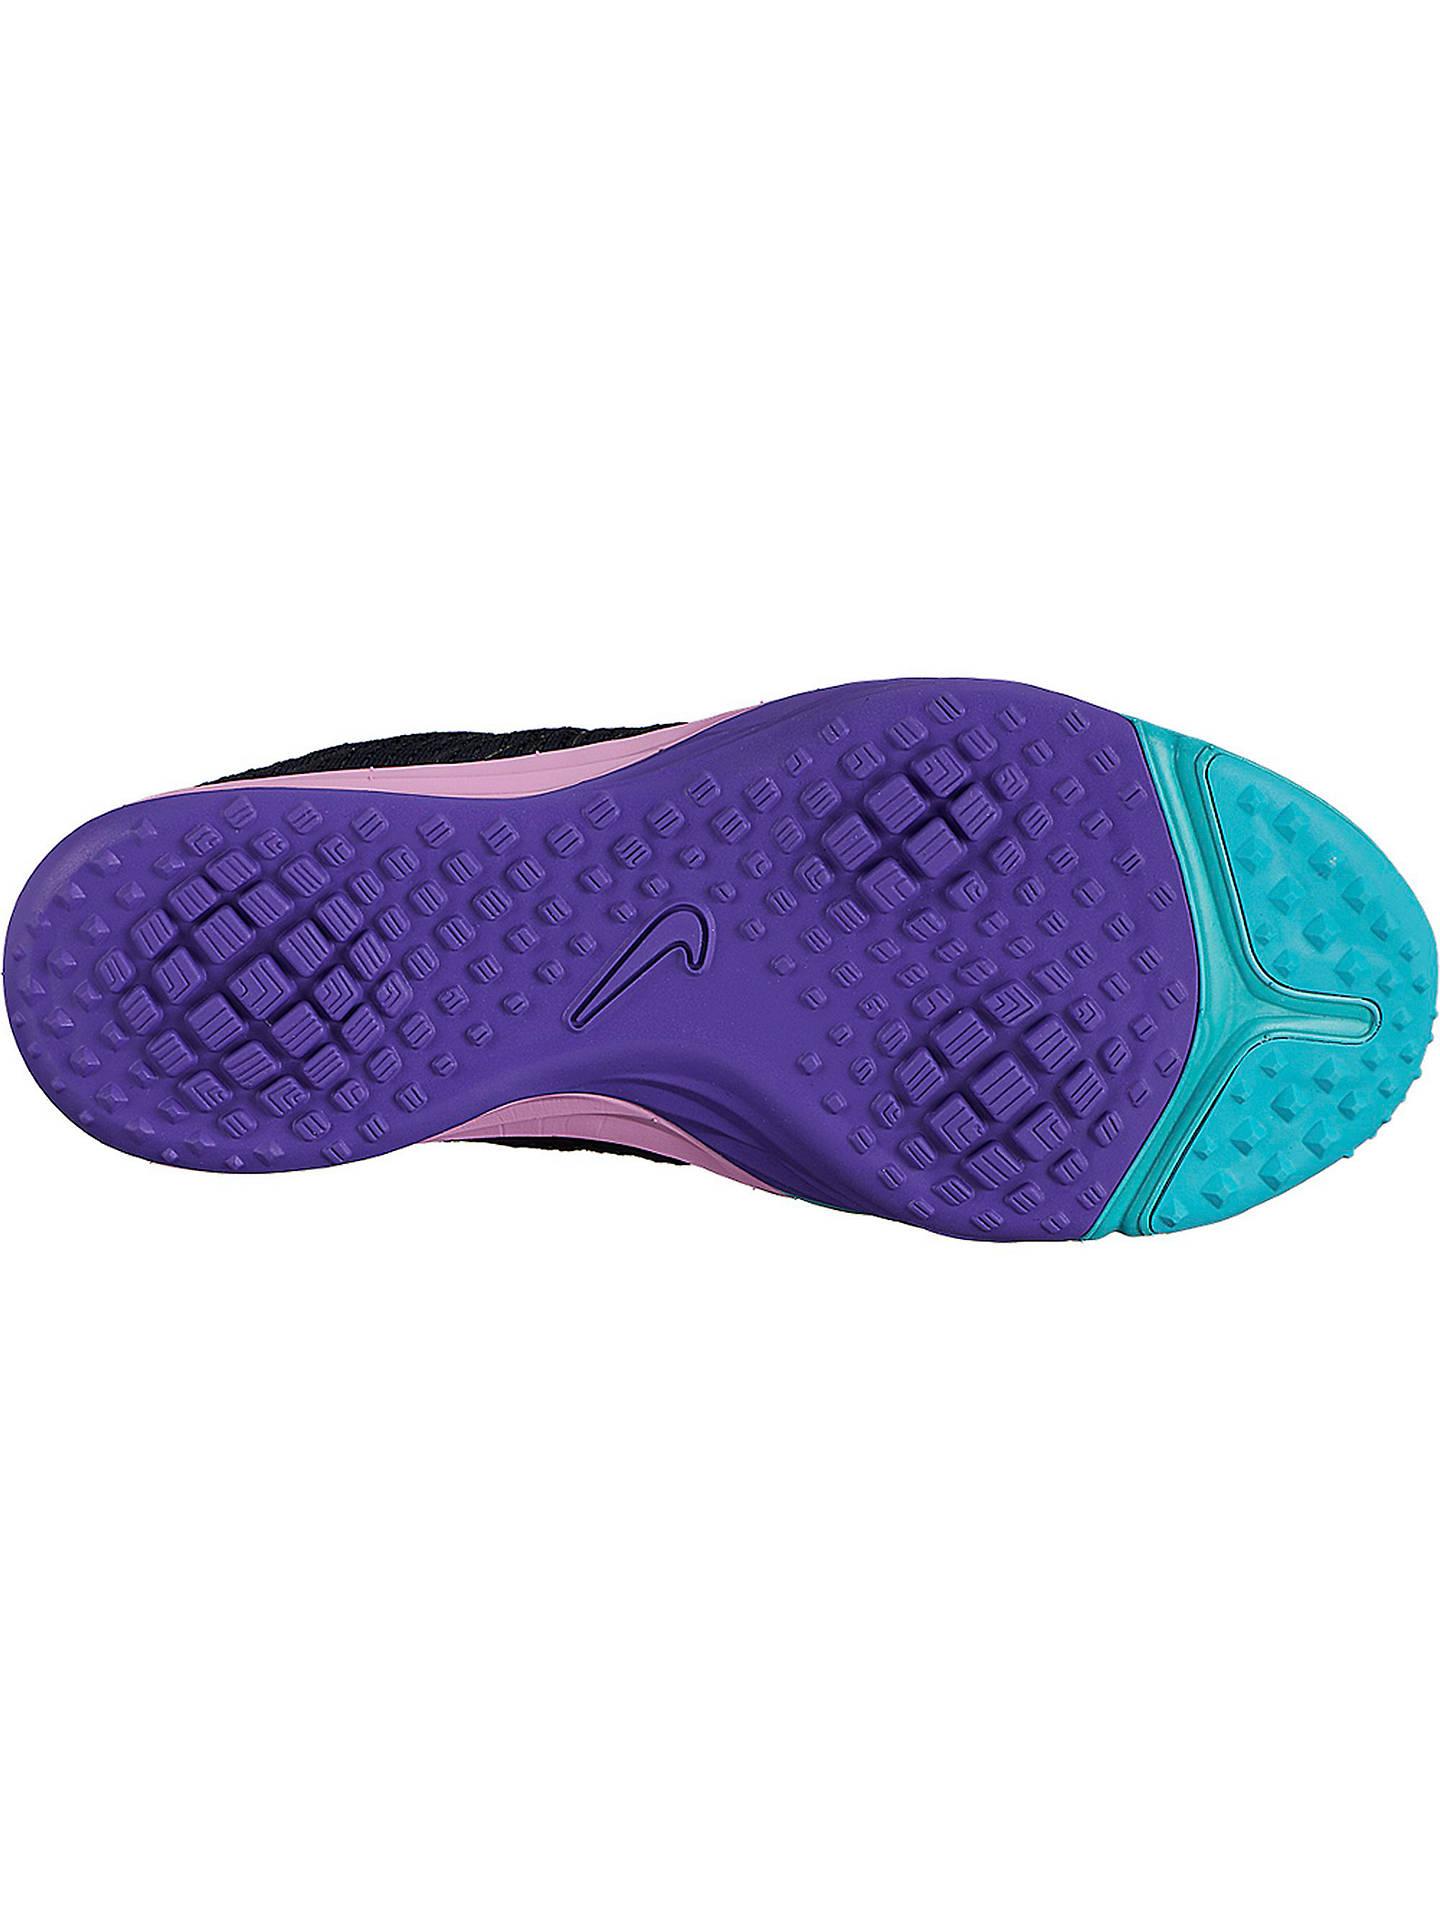 quality design 4f067 e3499 ... Buy Nike Lunar Cross Element Women s Cross Trainers, Carbon Grey Multi,  4 Online